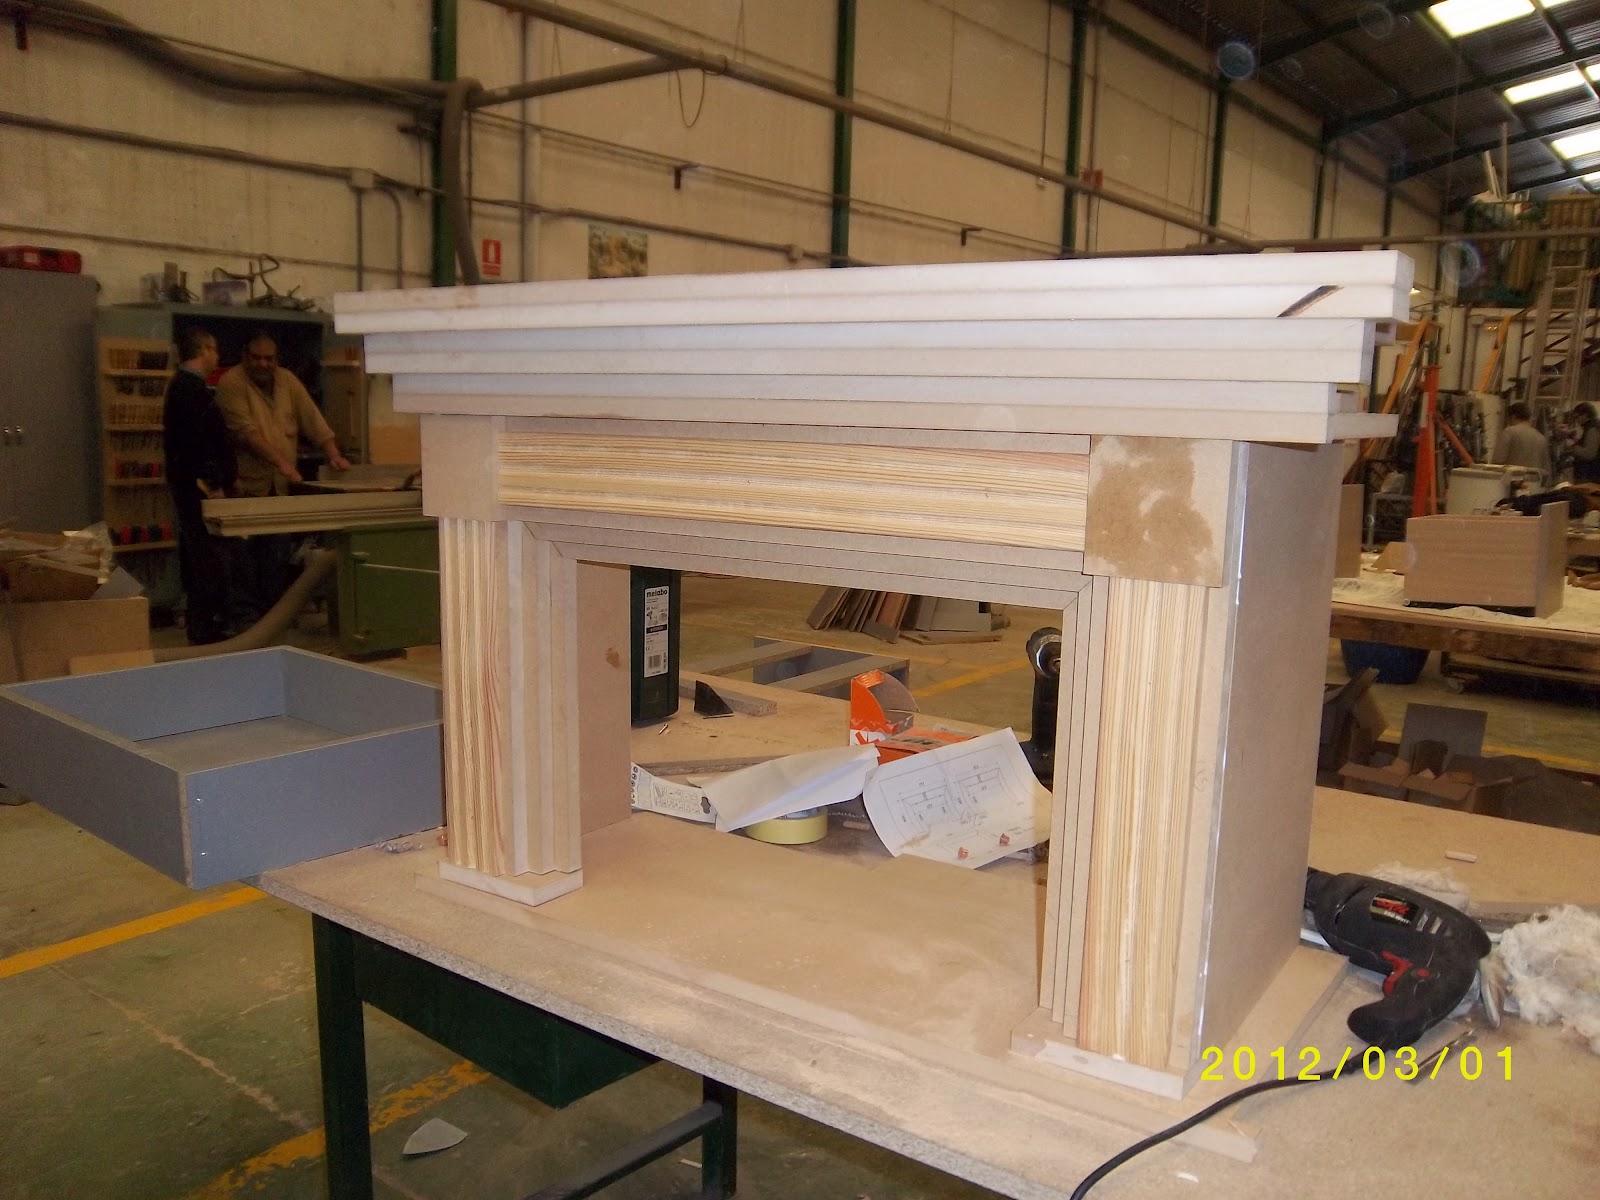 Hacer chimenea de obra stunning hacer chimenea de obra - Como hacer chimeneas decorativas ...